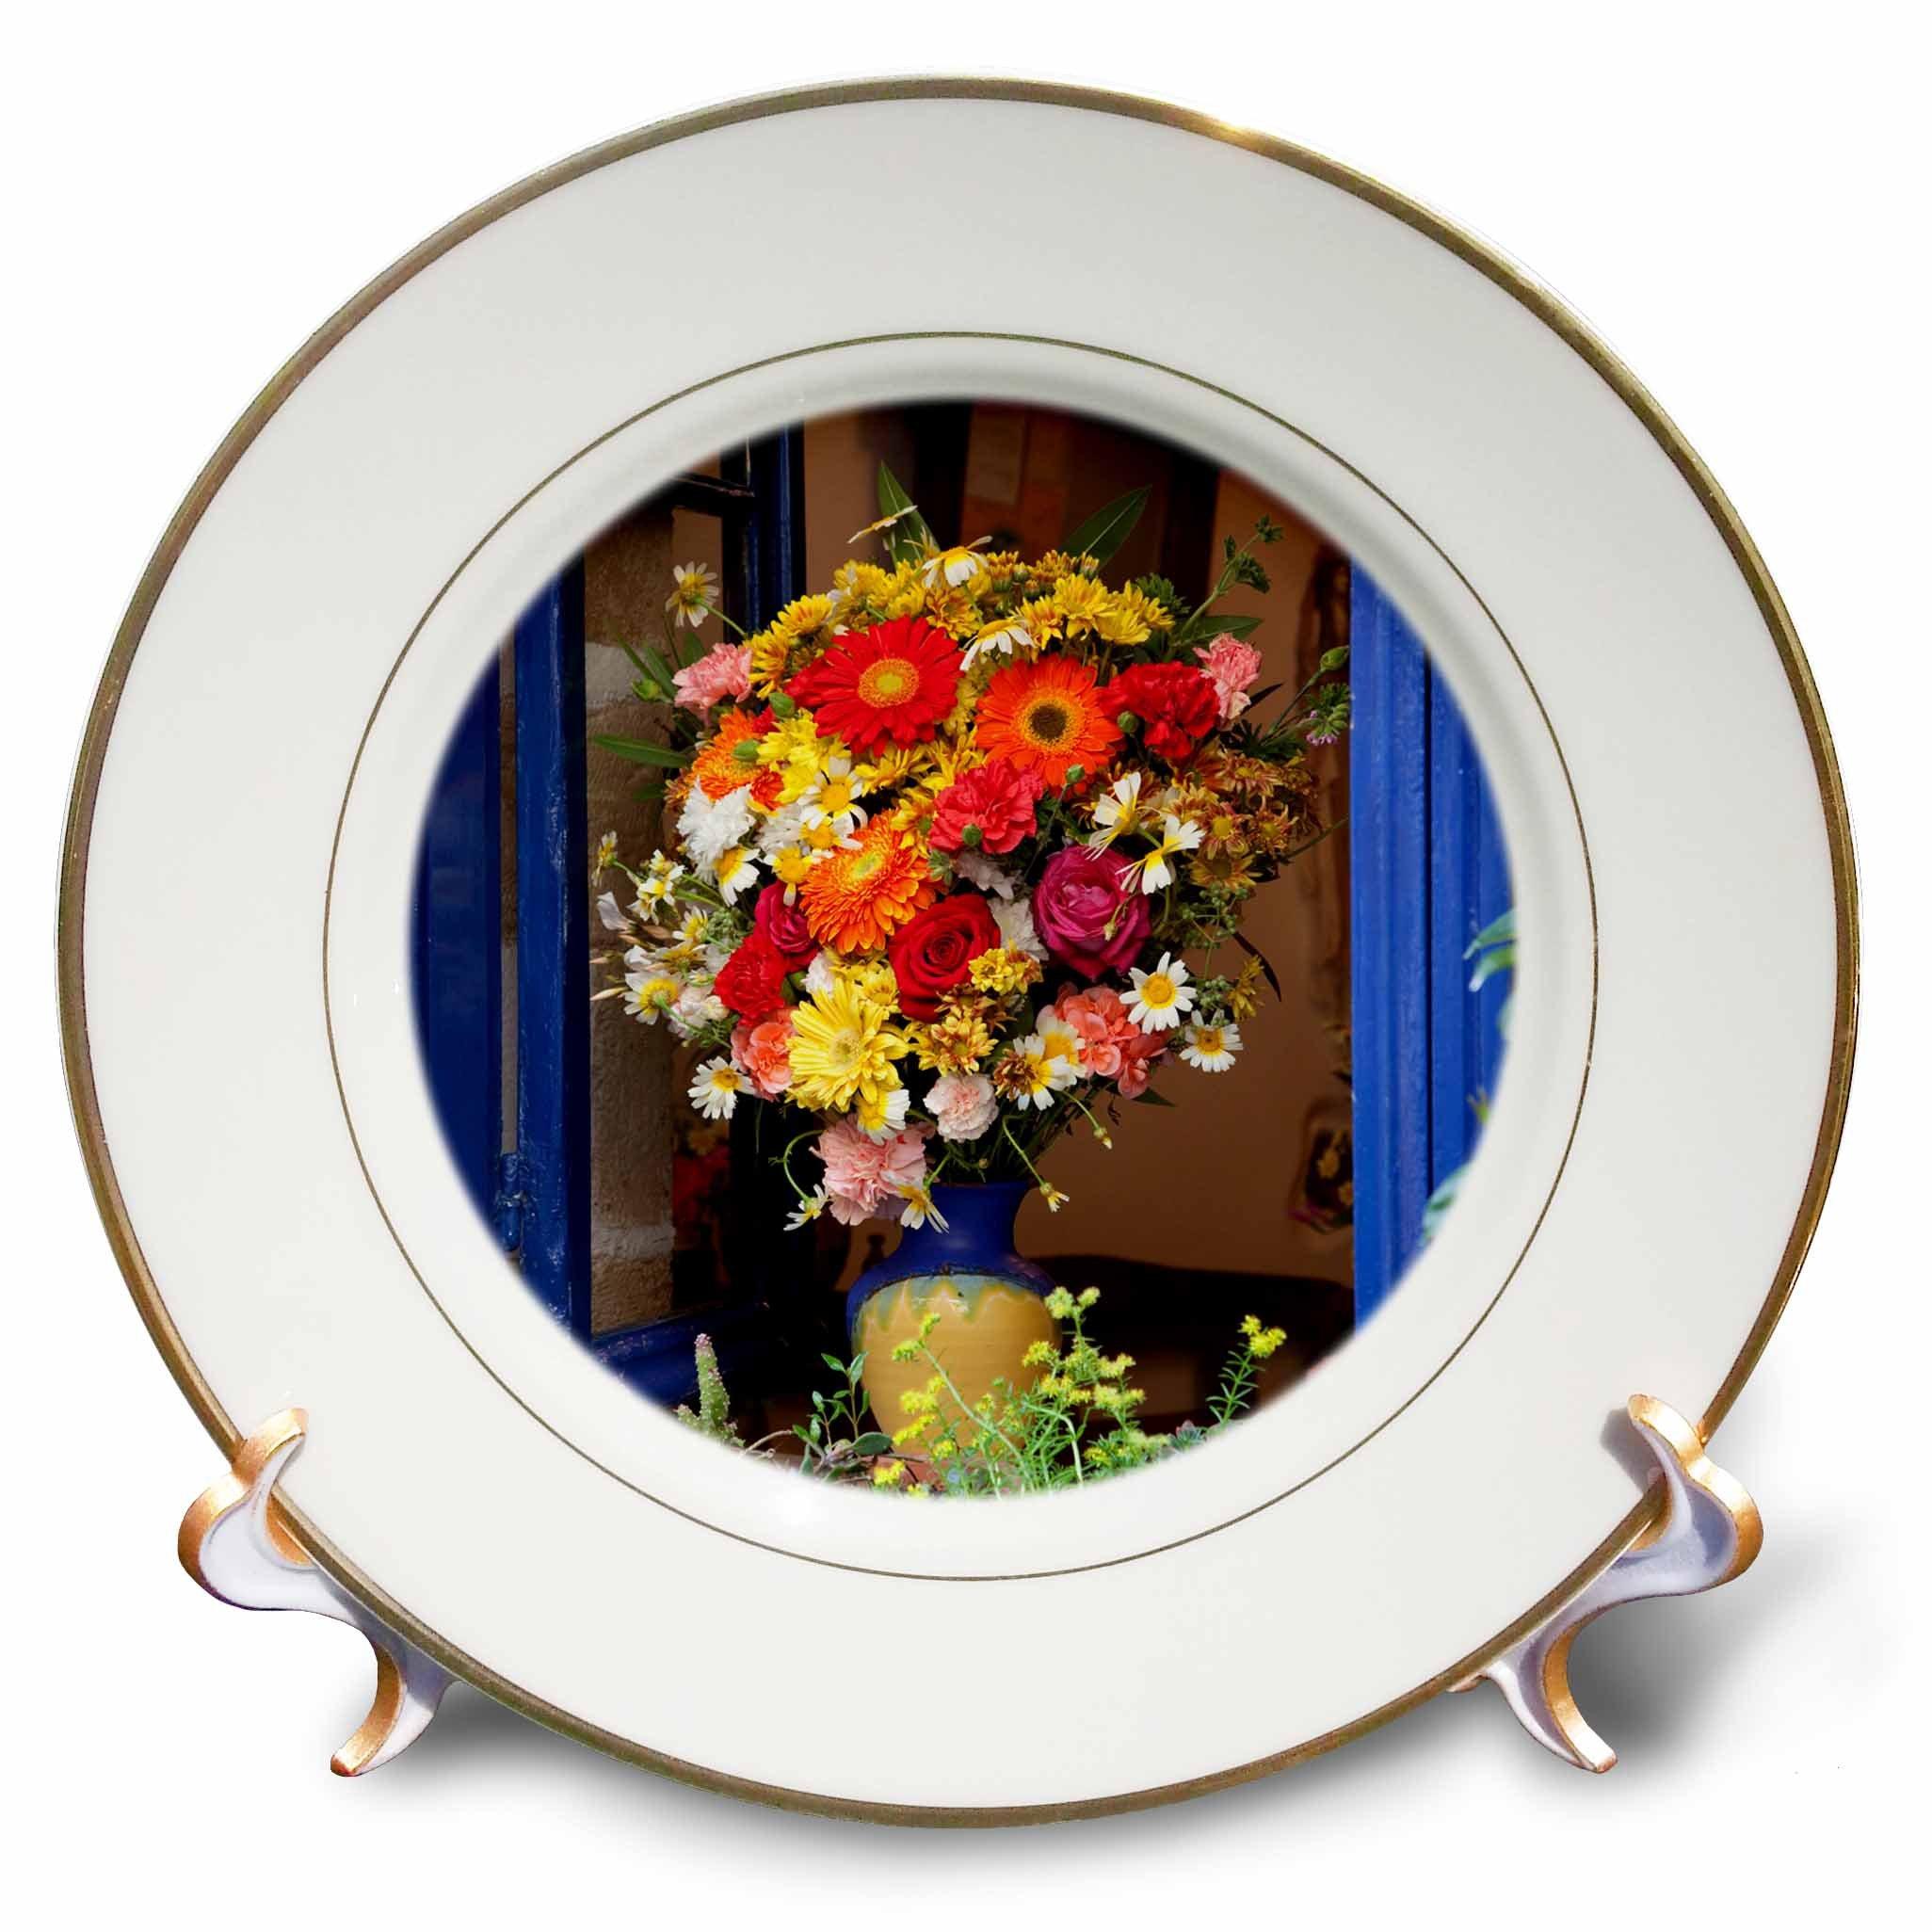 3dRose Danita Delimont - Flowers - Greece, Crete, Window with flowers - 8 inch Porcelain Plate (cp_277435_1)